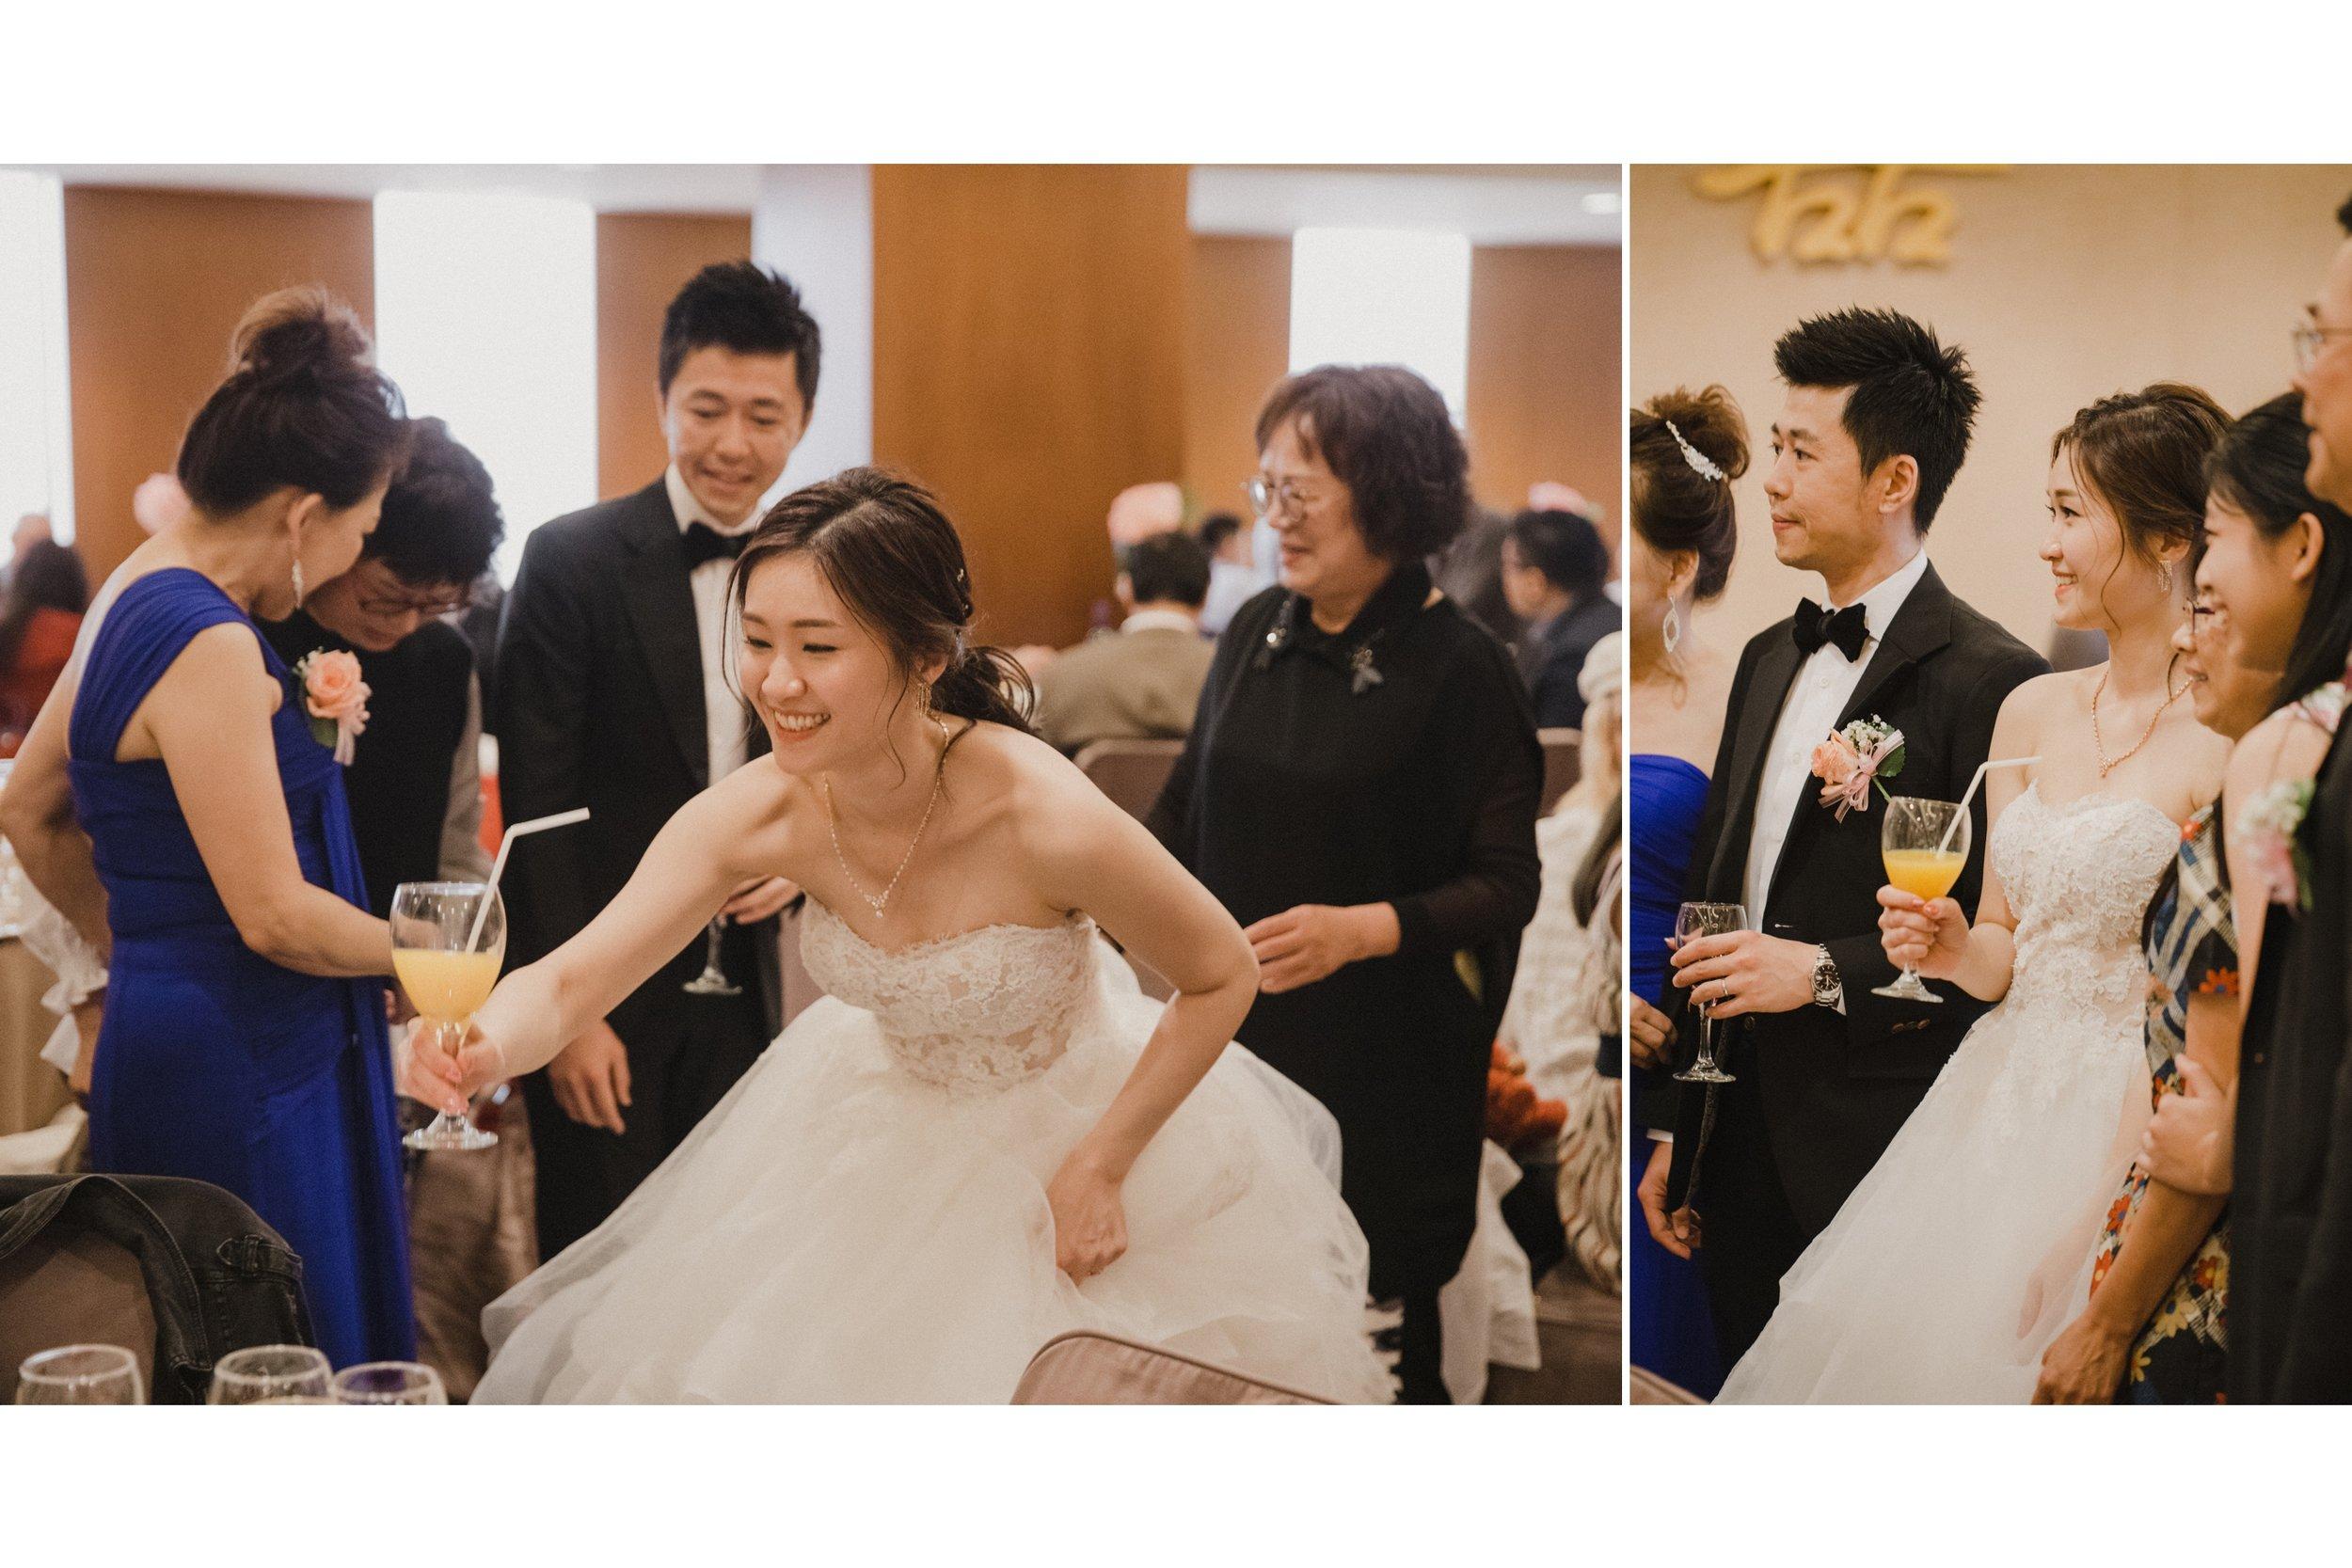 wedding-caridee-oscar-lunch-ambassador-hsinchu-結婚午宴-新竹國賓_139.jpg